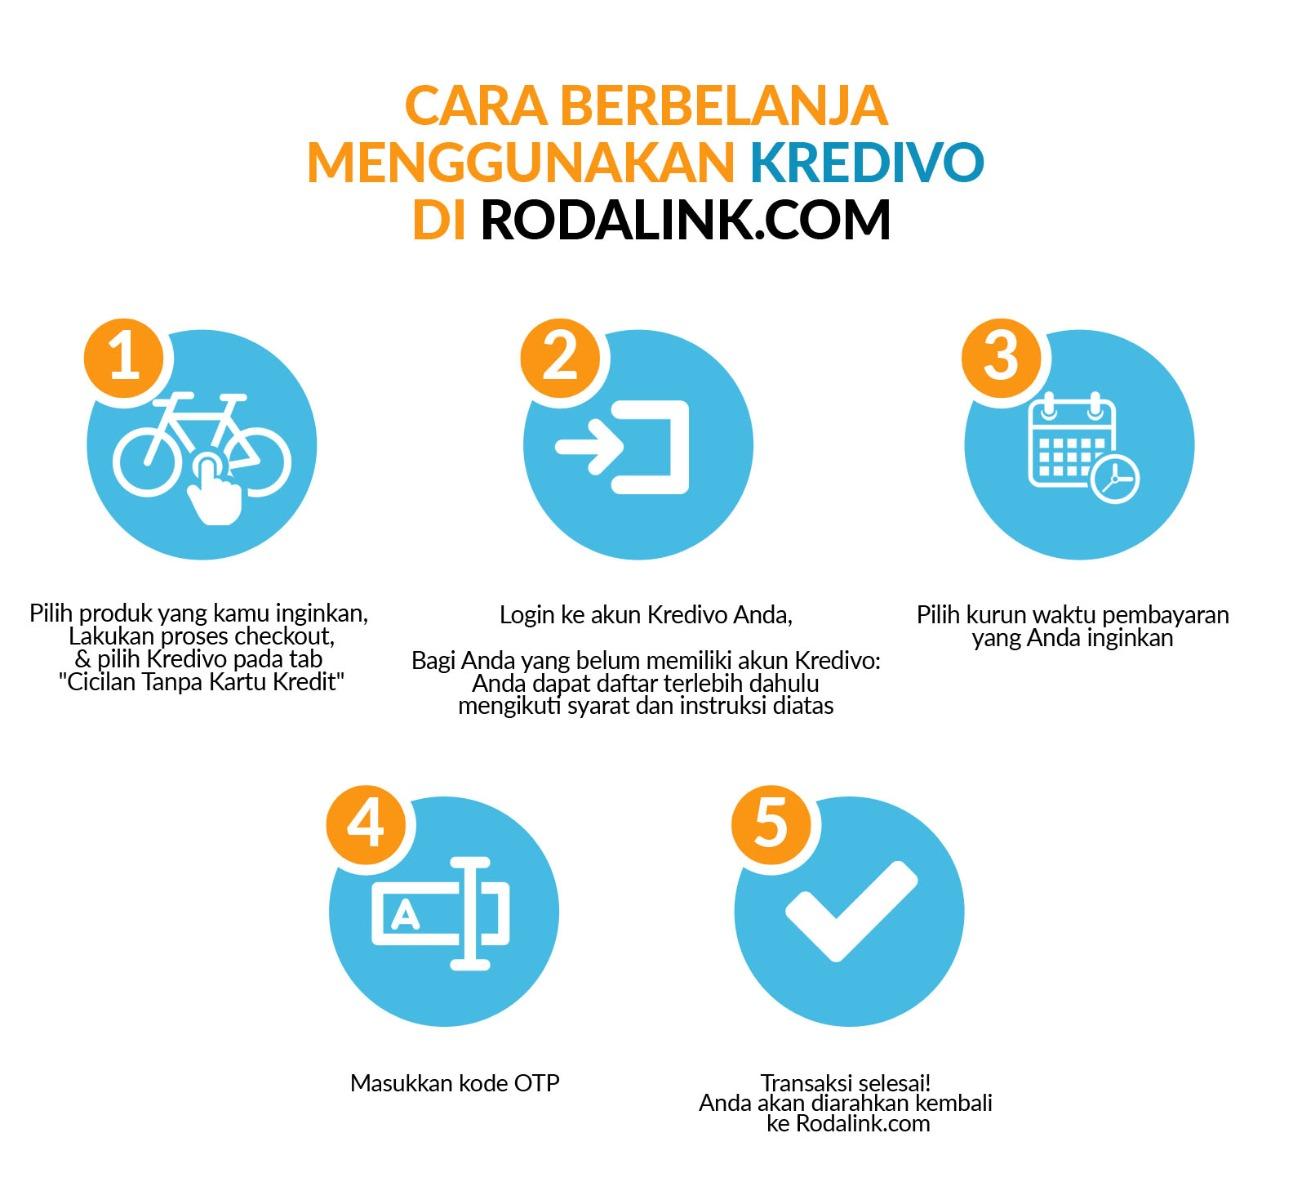 Cara Berbelanja menggunakan Kredivo di Rodalink.com